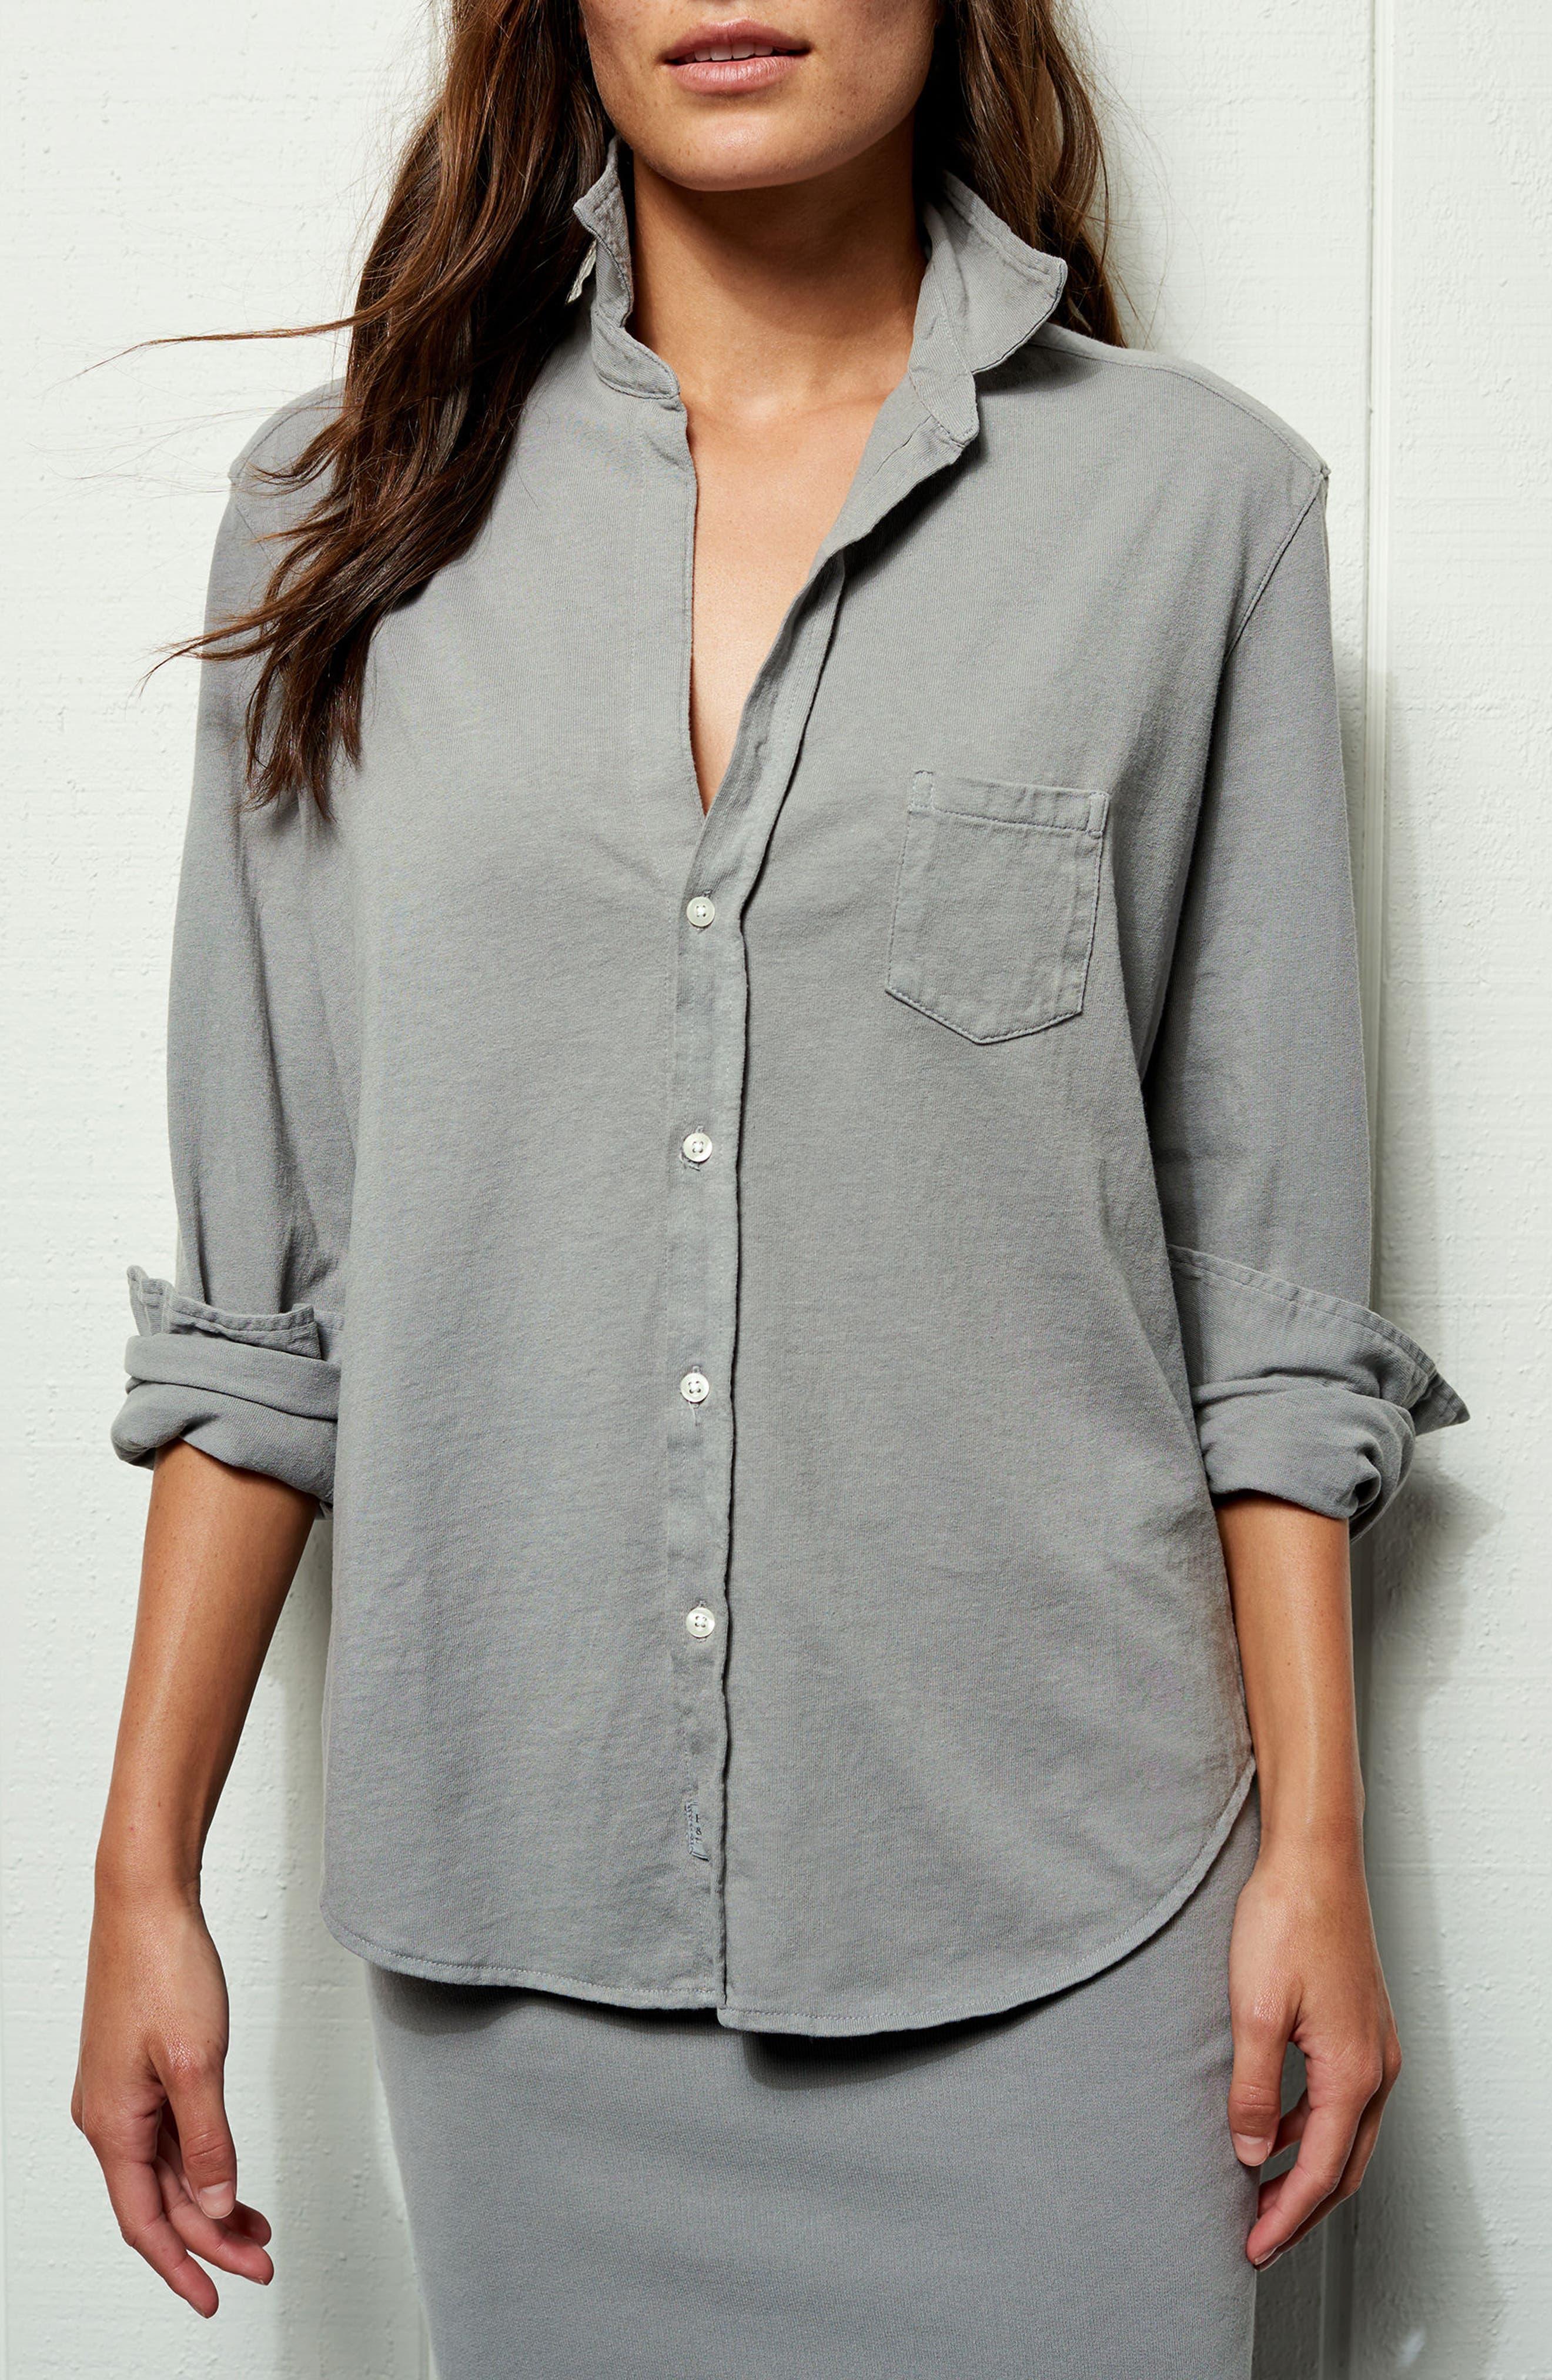 Tee Lab Knit Button Down Shirt,                             Alternate thumbnail 7, color,                             Shadow